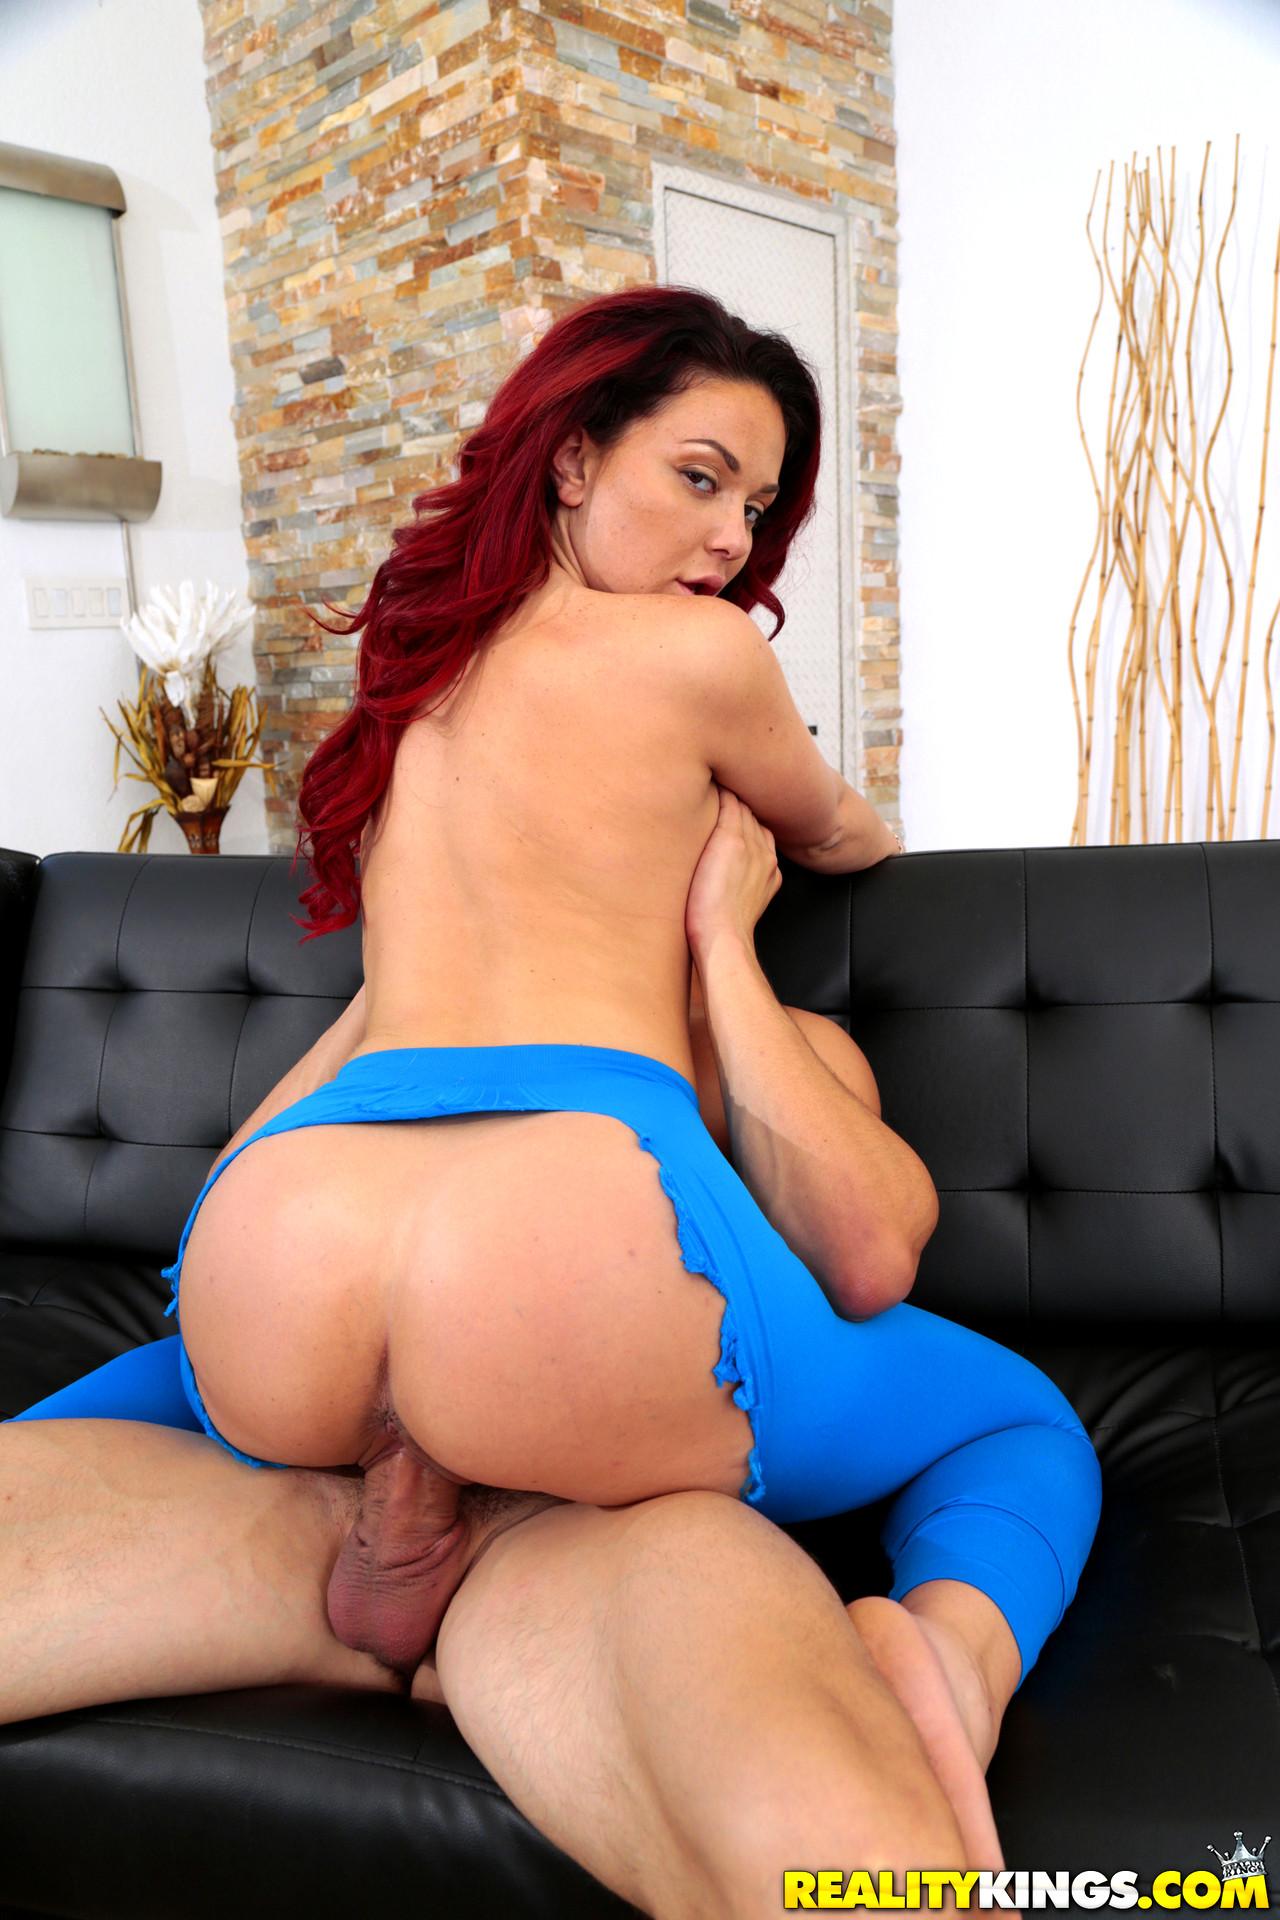 from Dominique hardcore yoga pants porn